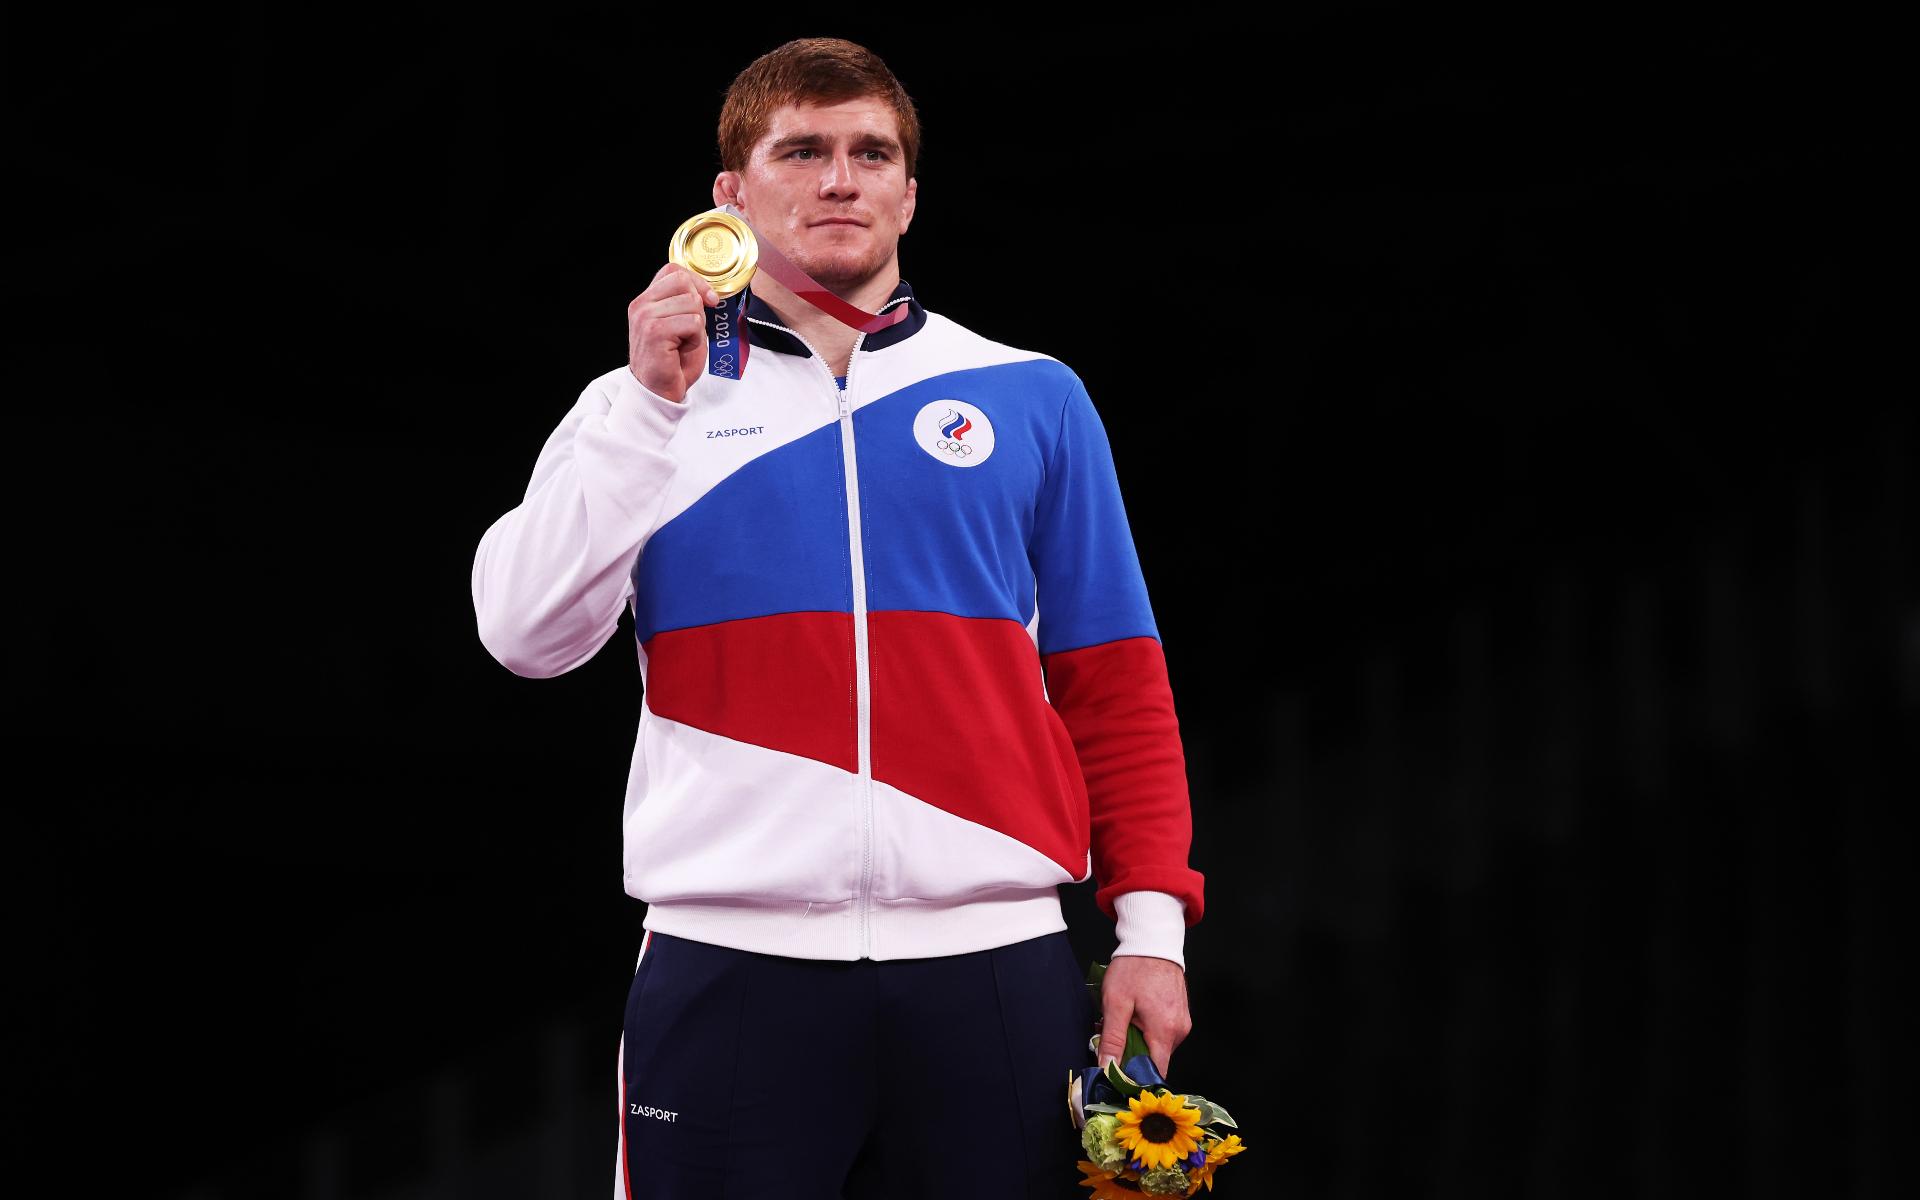 Фото: Муса Евлоев (Photo by Tom Pennington/Getty Images)